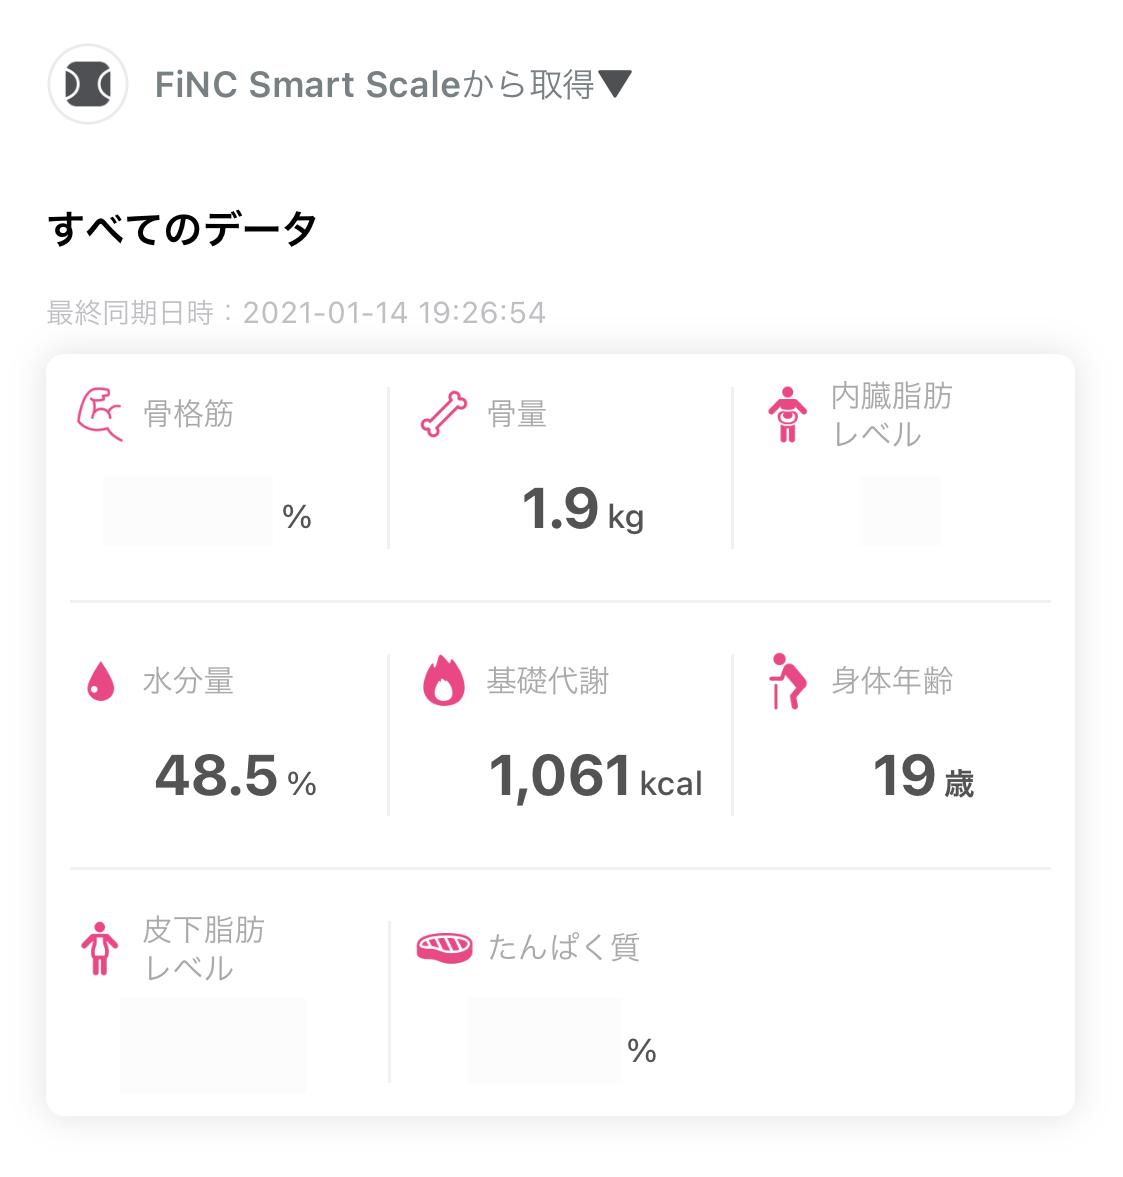 f:id:jyokyodaigakusei:20210115125326p:plain